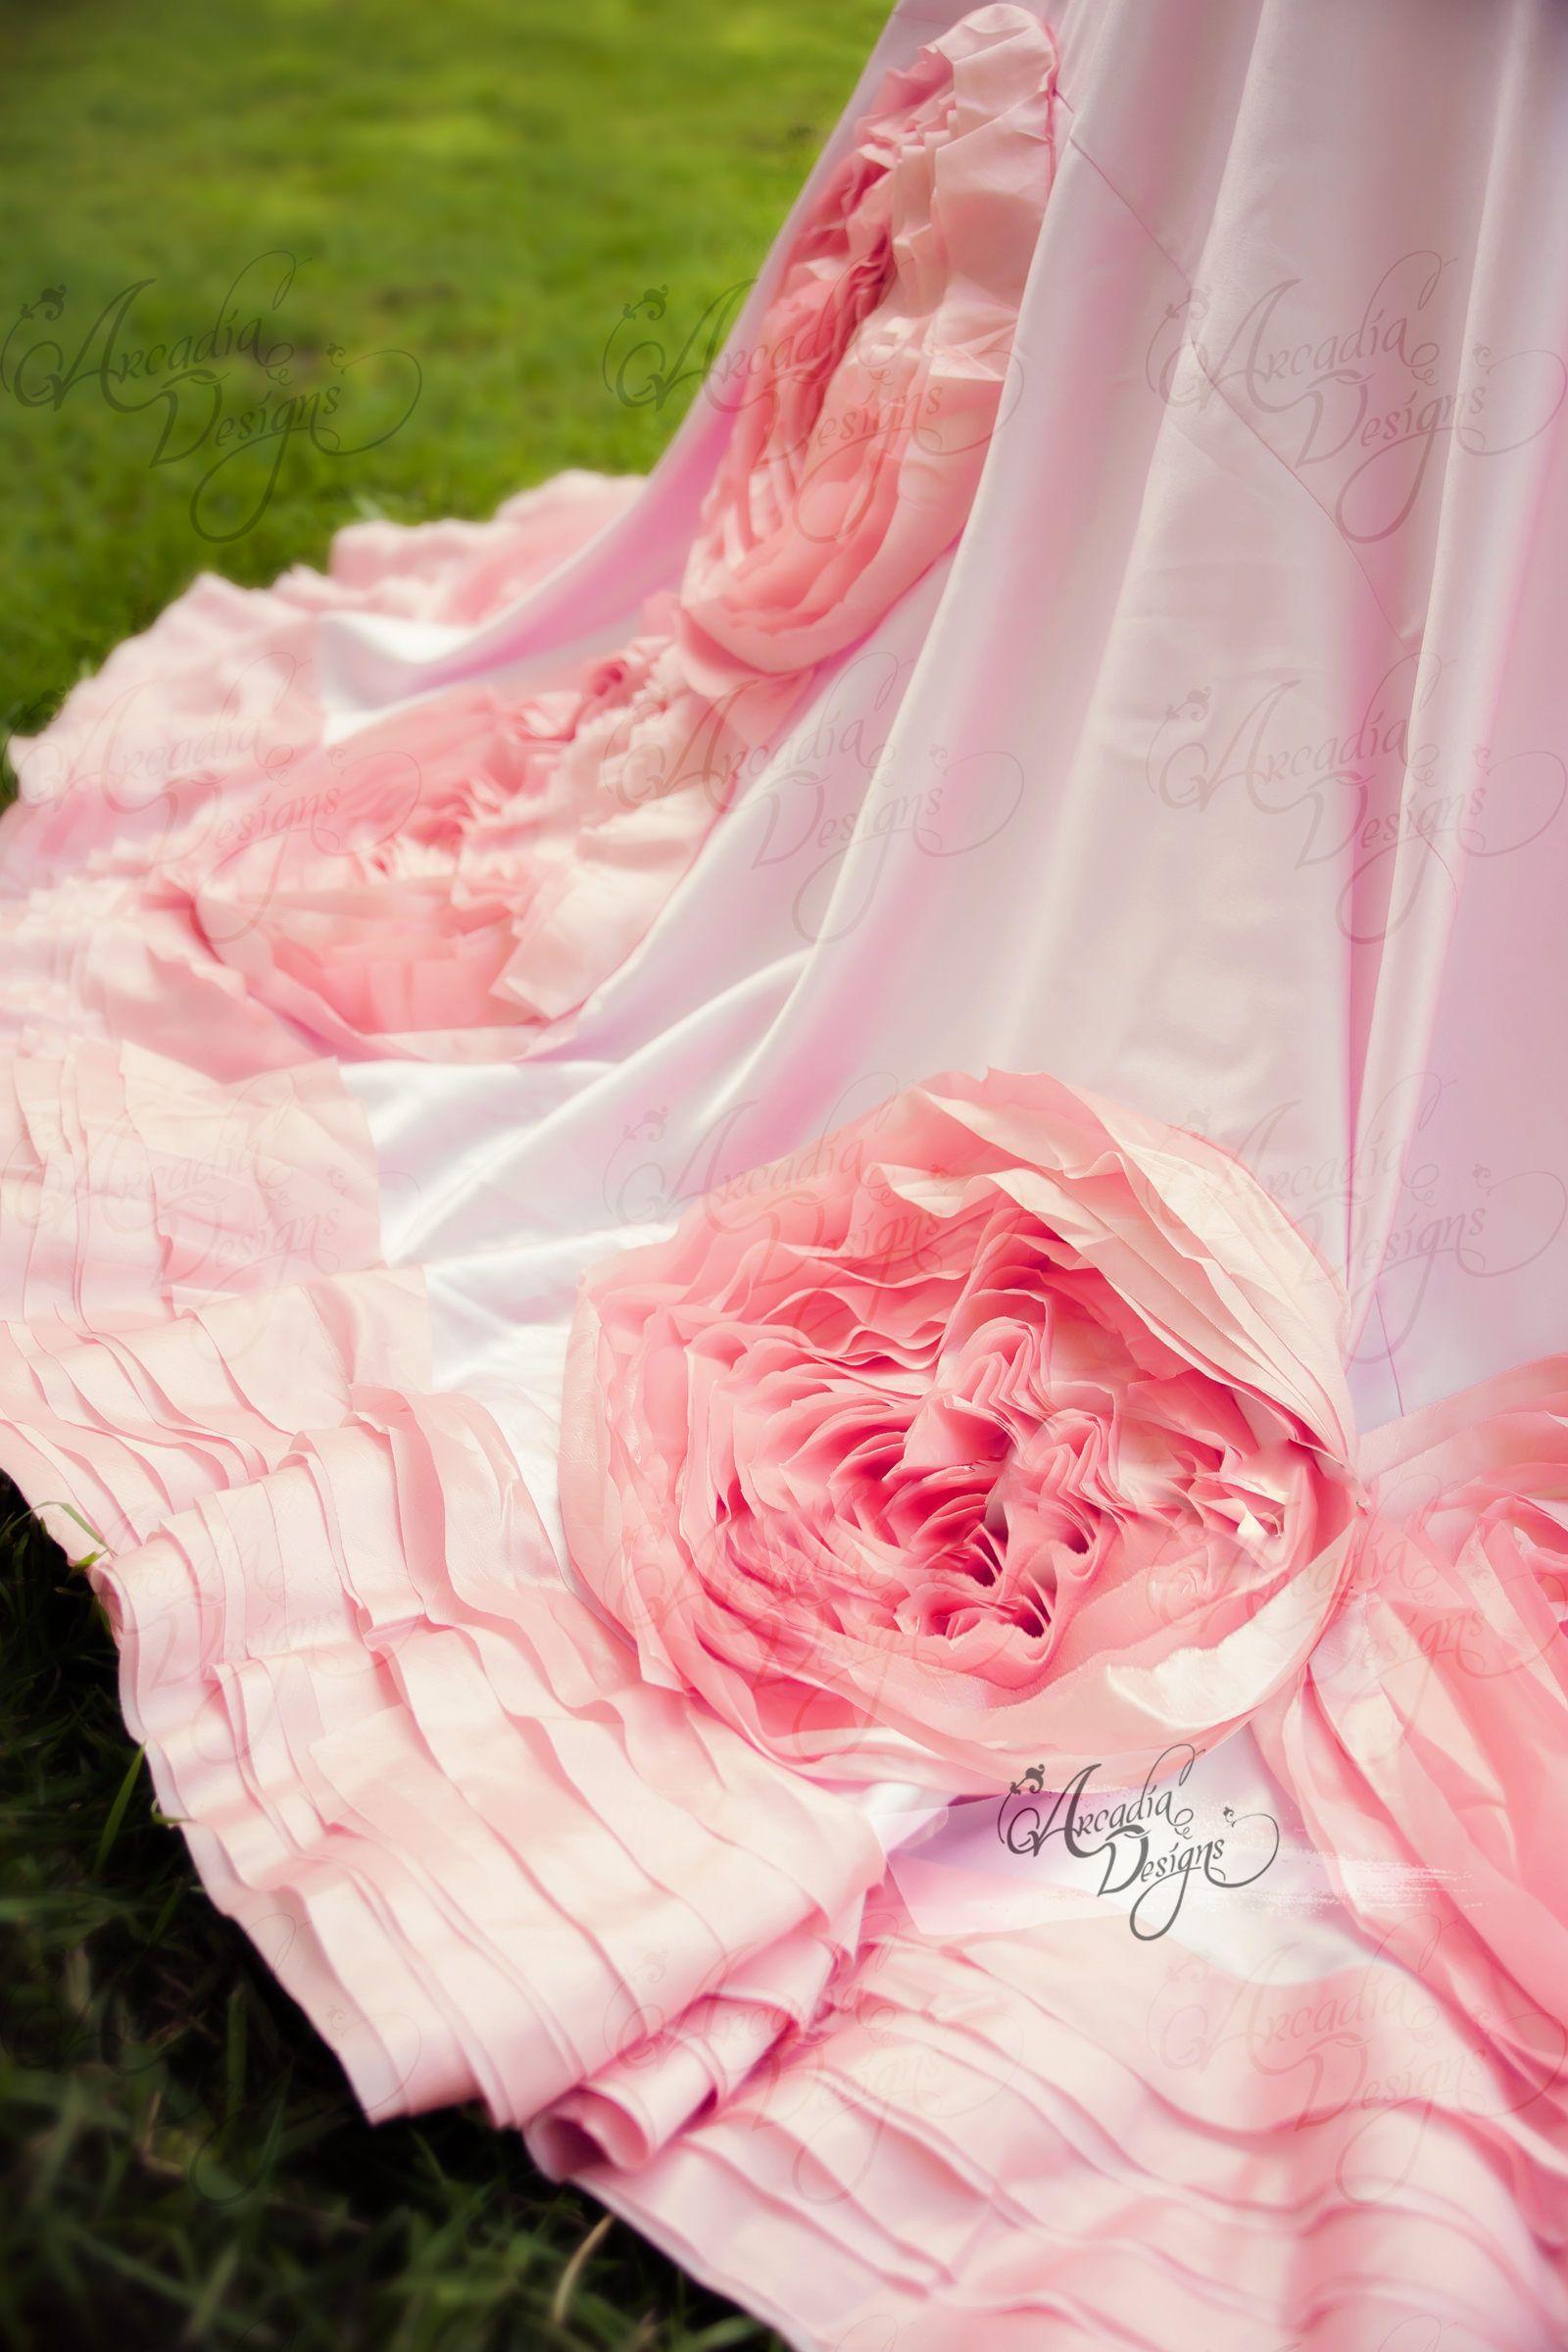 Rosette Tablecloth | Romantic Taffeta Satin Rose Tablecloth for ...